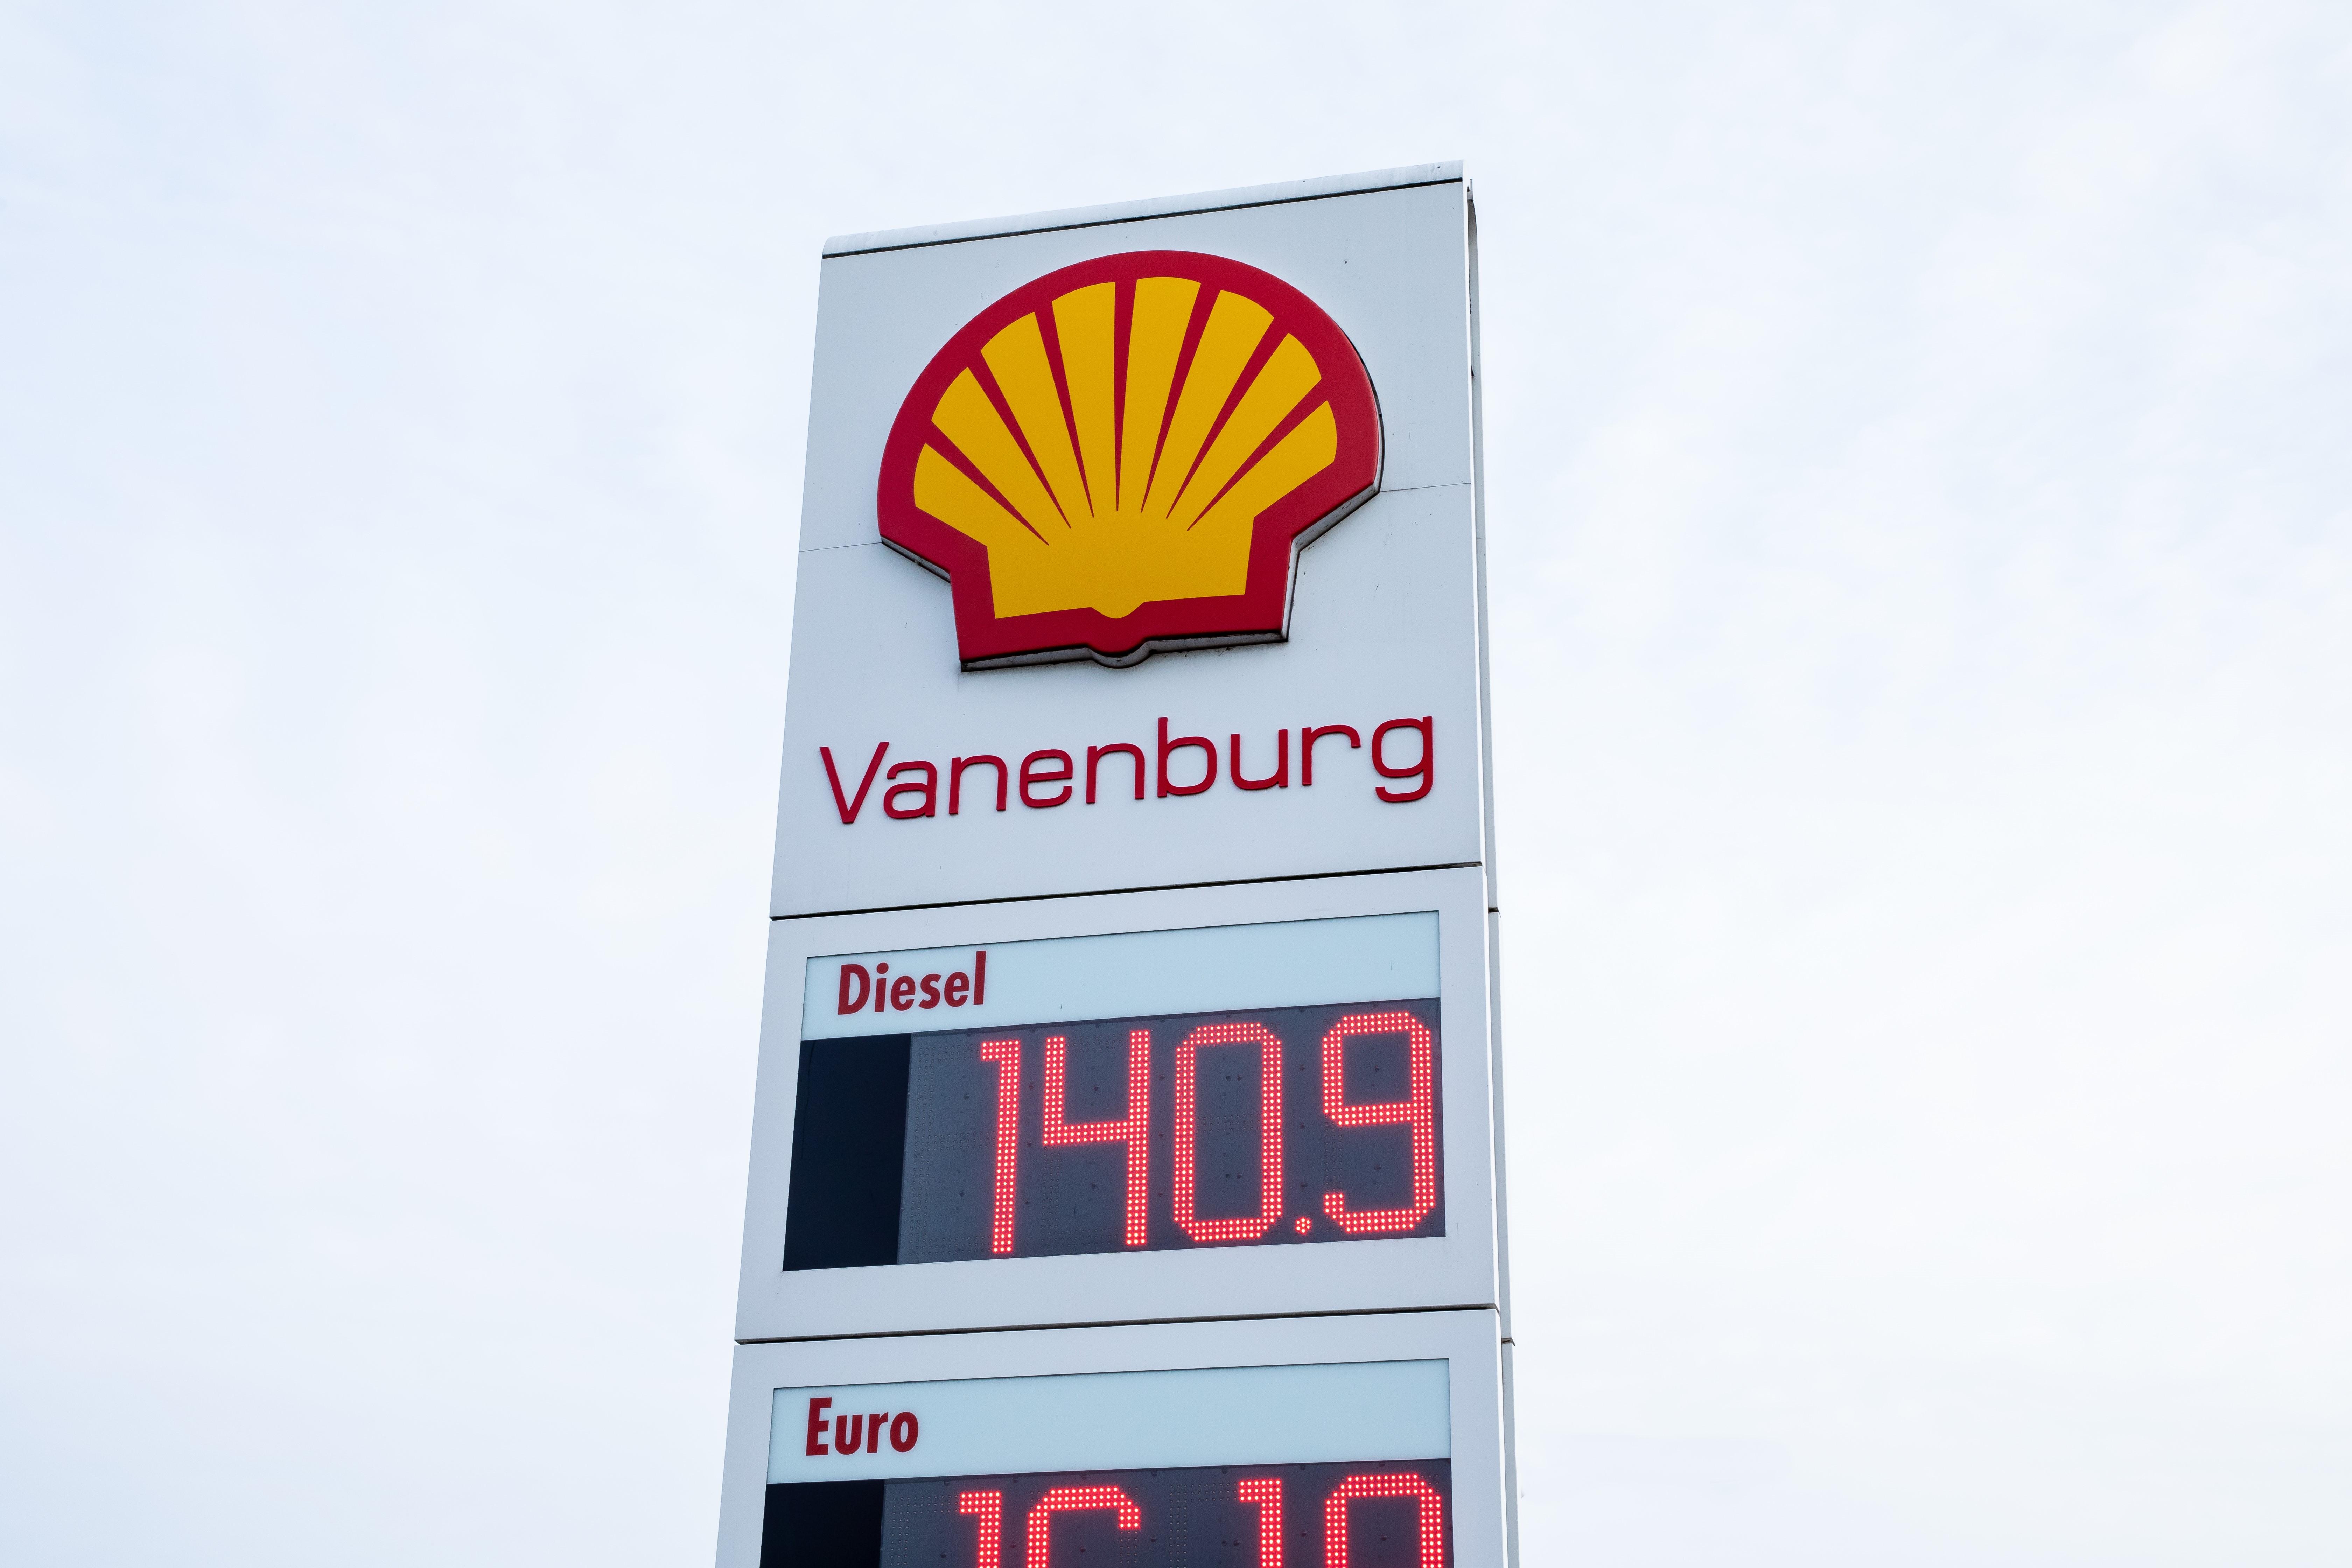 vanenburg-logo-reclame